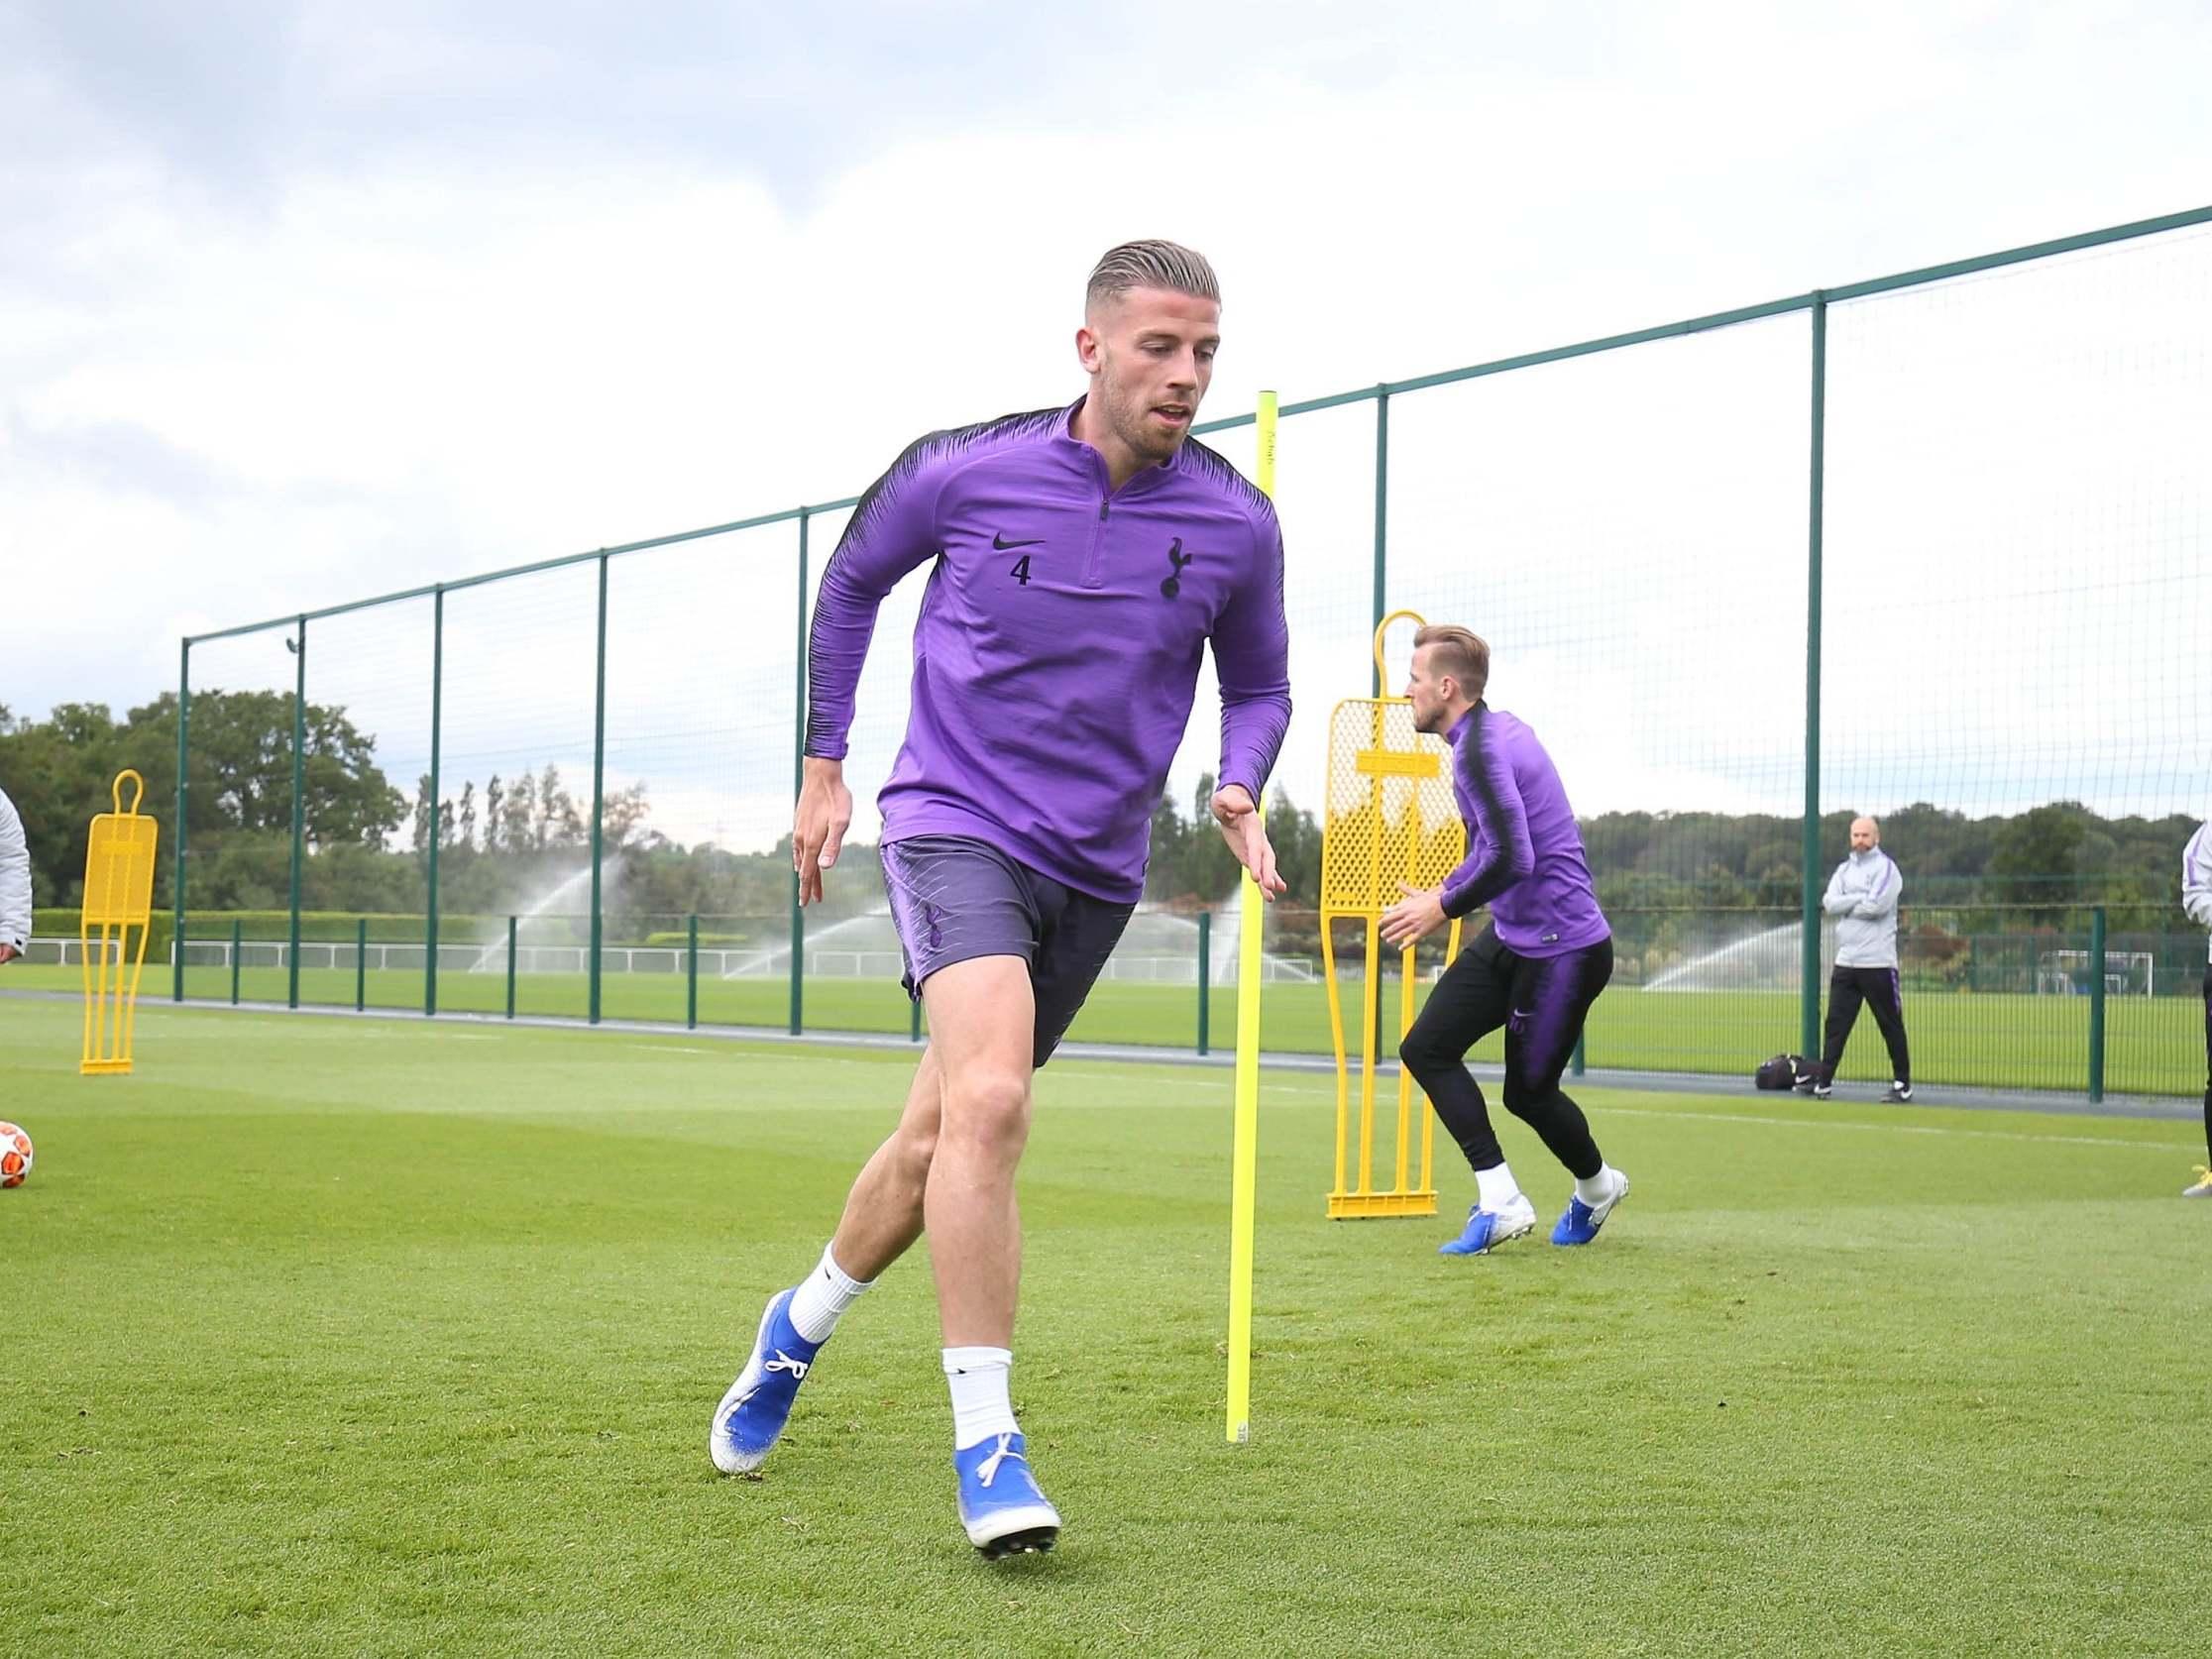 88491a2f51f Champions League Final – Tottenham vs Liverpool  Toby Alderweireld reveals  Spurs are training  like animals  - Newscabal